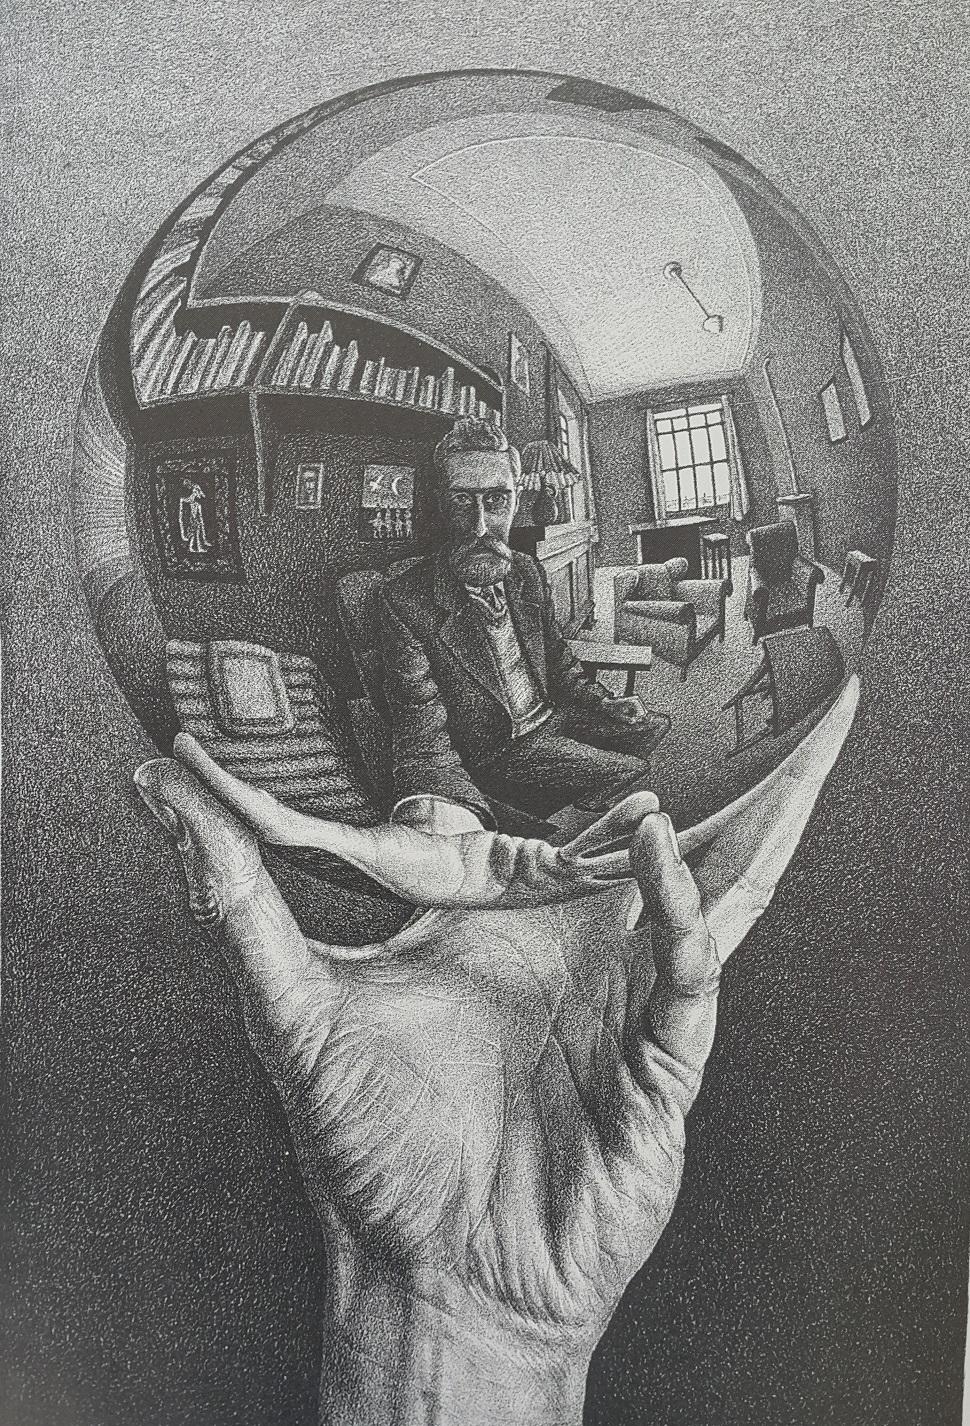 Hand with Reflecting Sphere (반사 공을 든 손), 1935